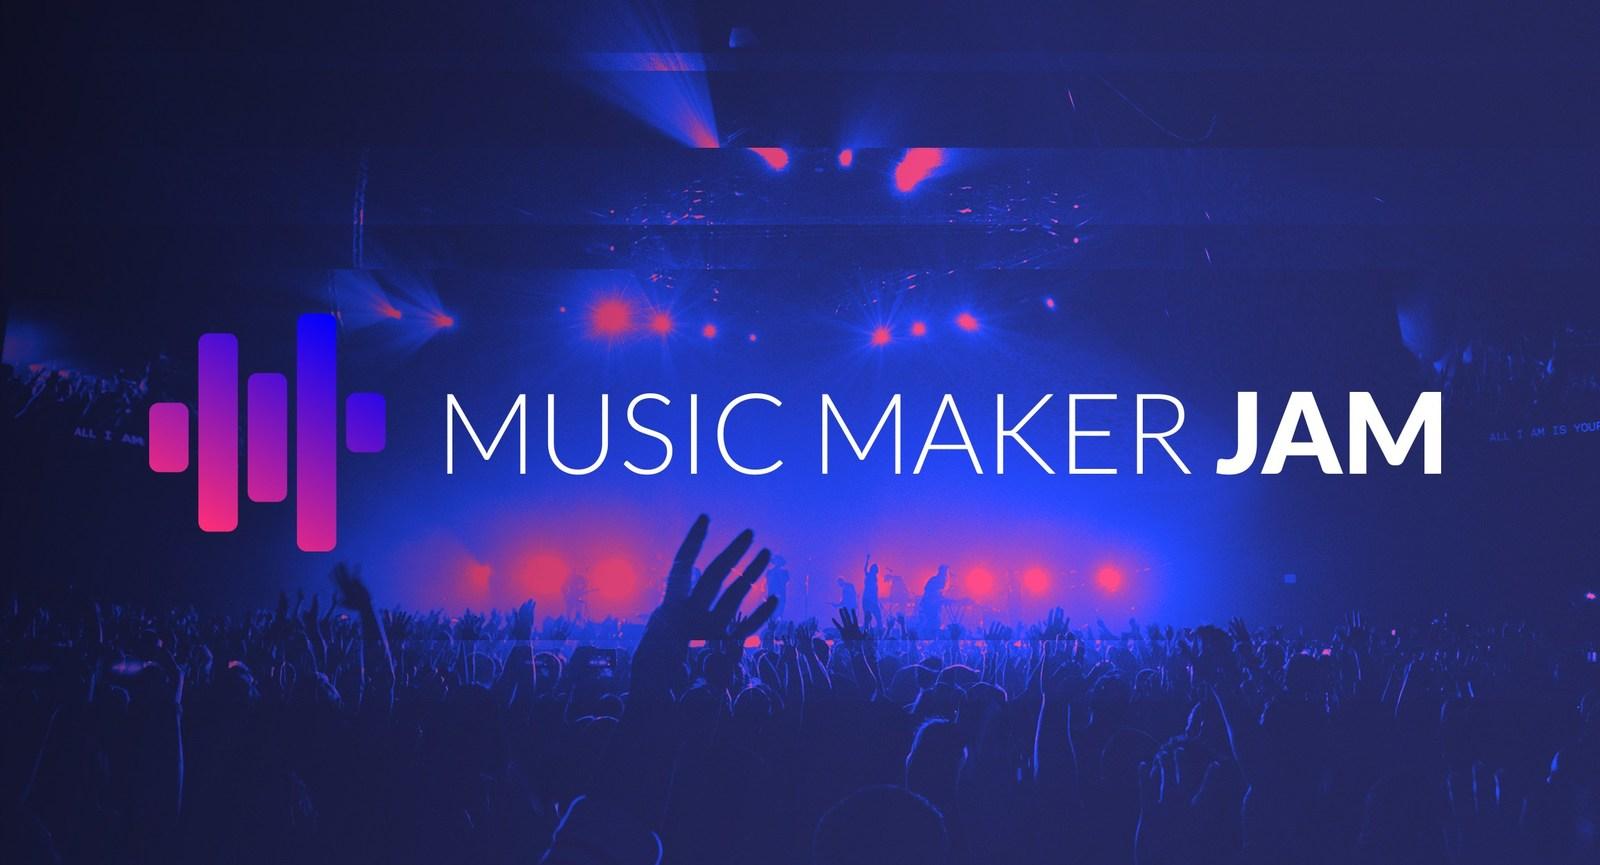 jam social music creation app just hit 5 million registered users. Black Bedroom Furniture Sets. Home Design Ideas